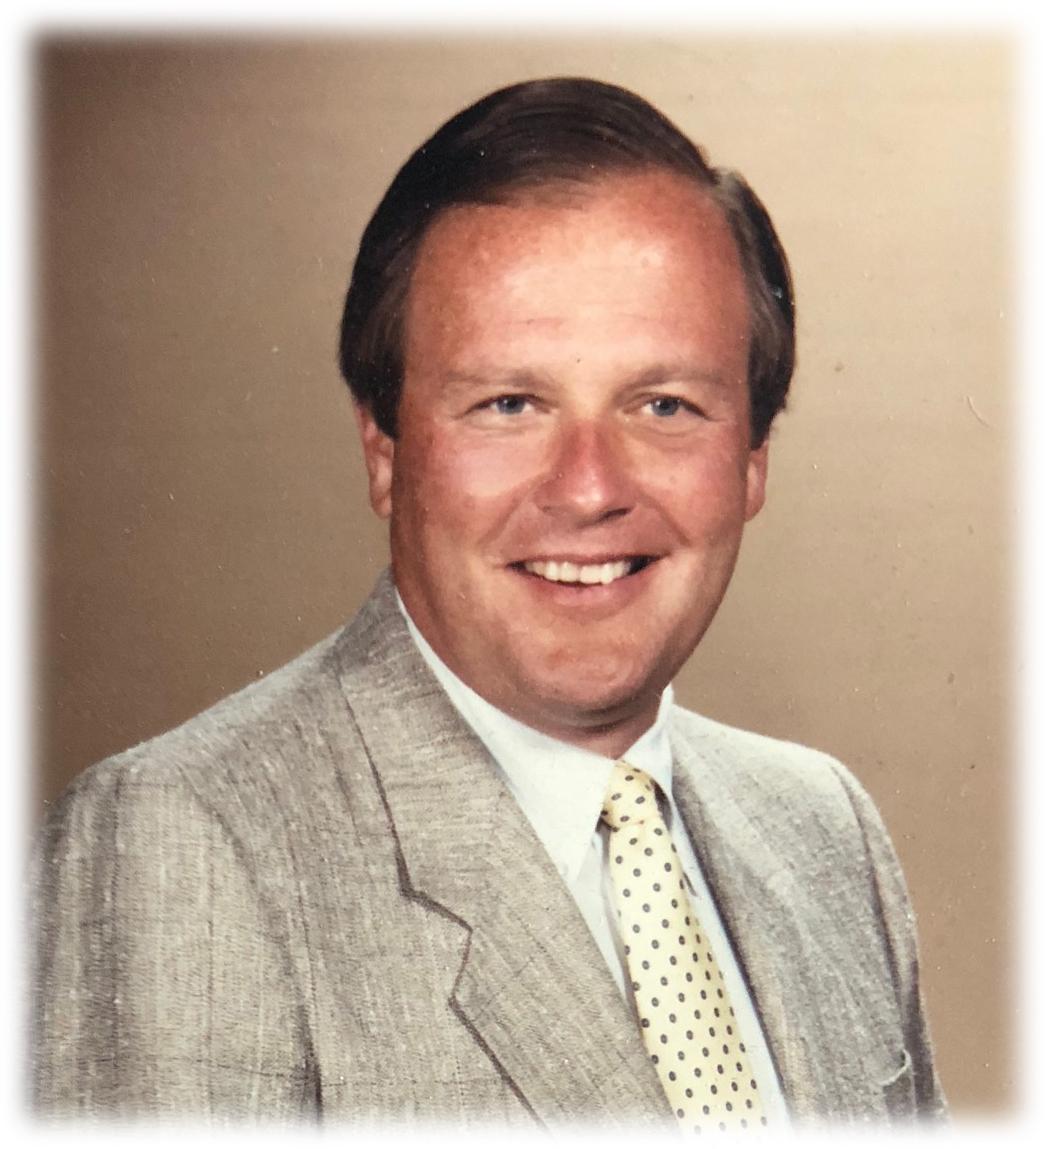 Dennis Howard Lundgren